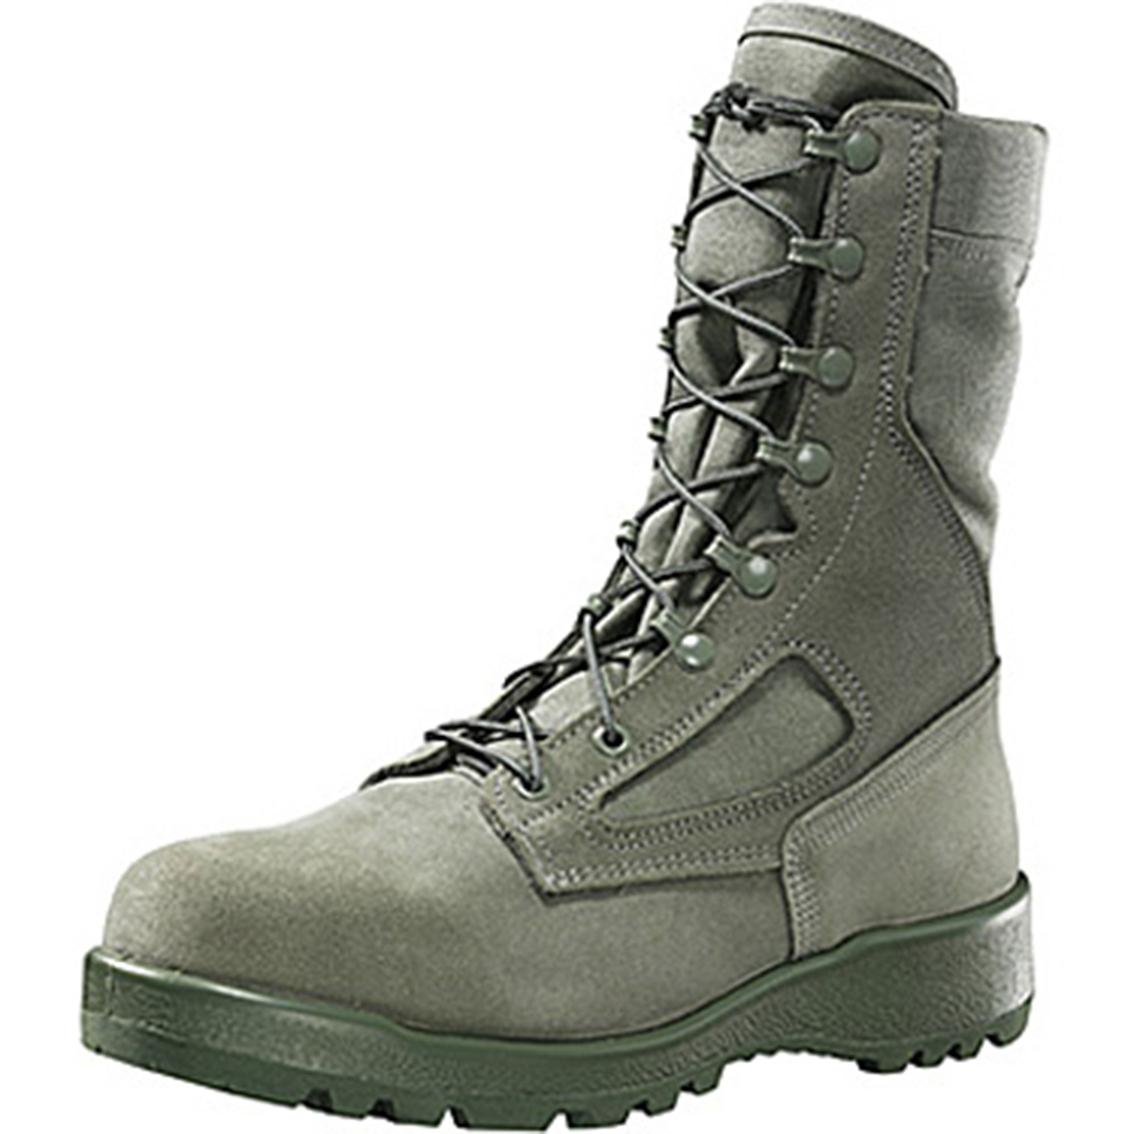 4e0a4315cdf6 Belleville Women s 600t Hot Weather Safety Toe Boots